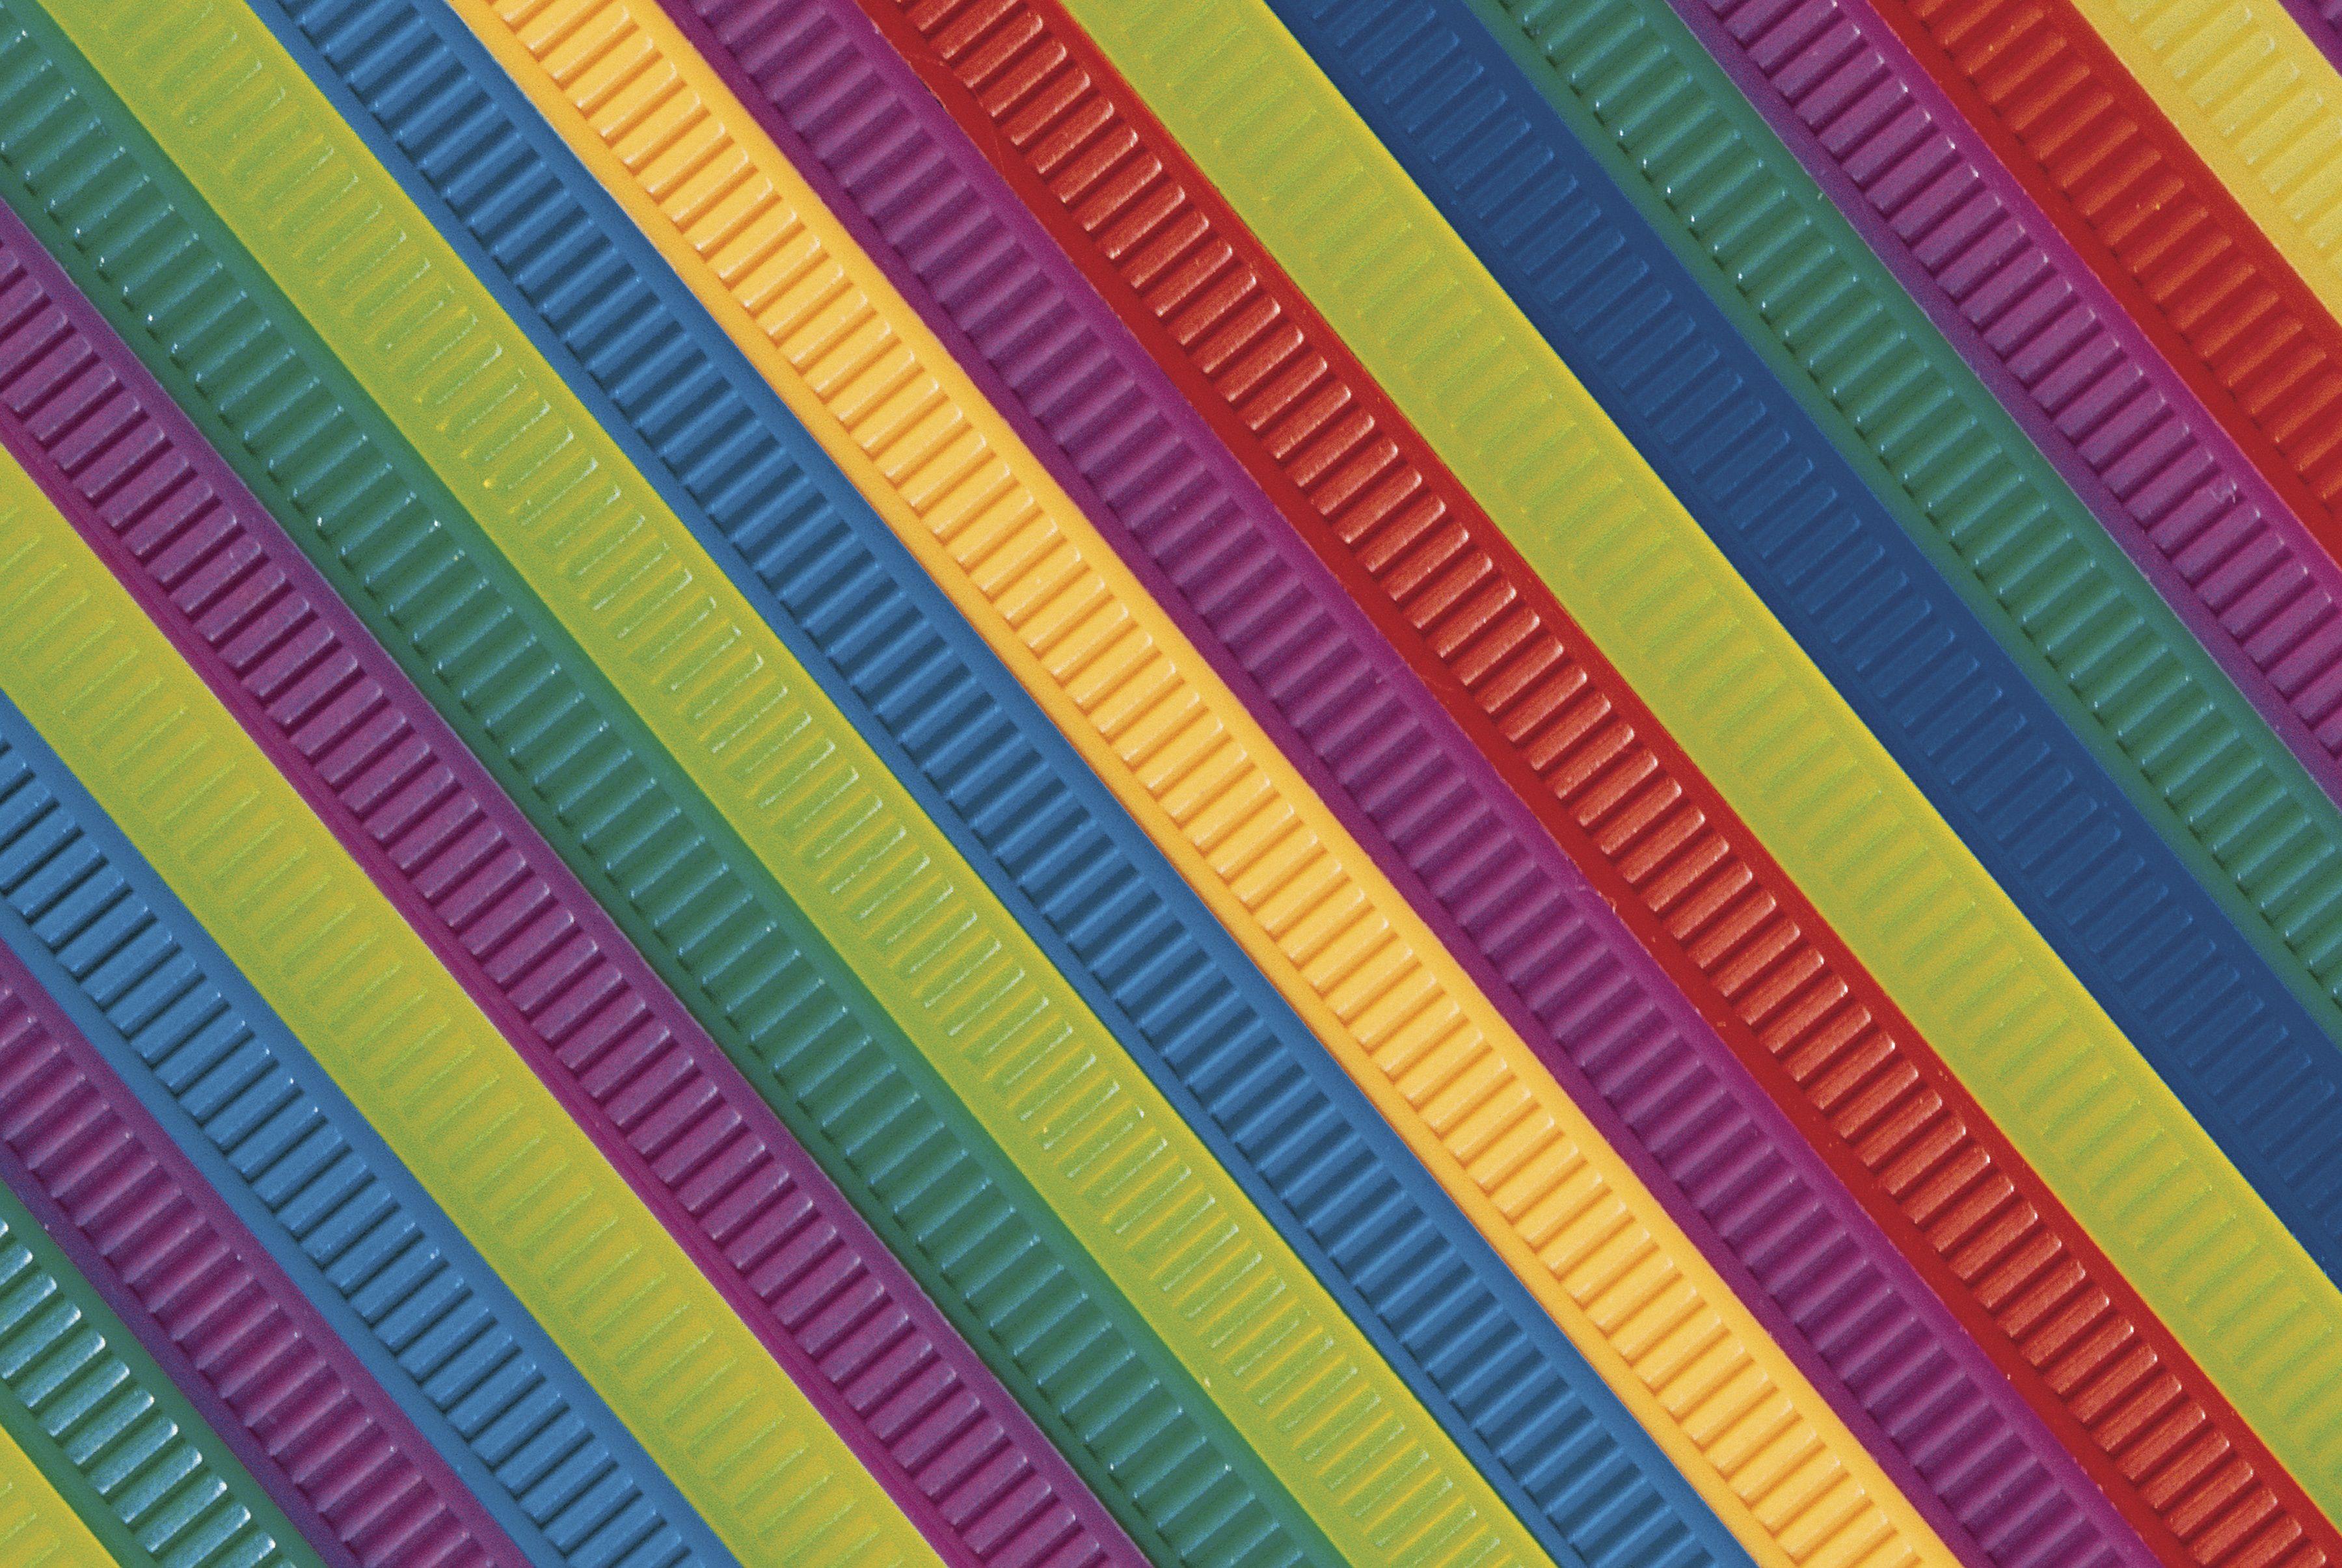 Zip Ties in a Rainbow of Colors